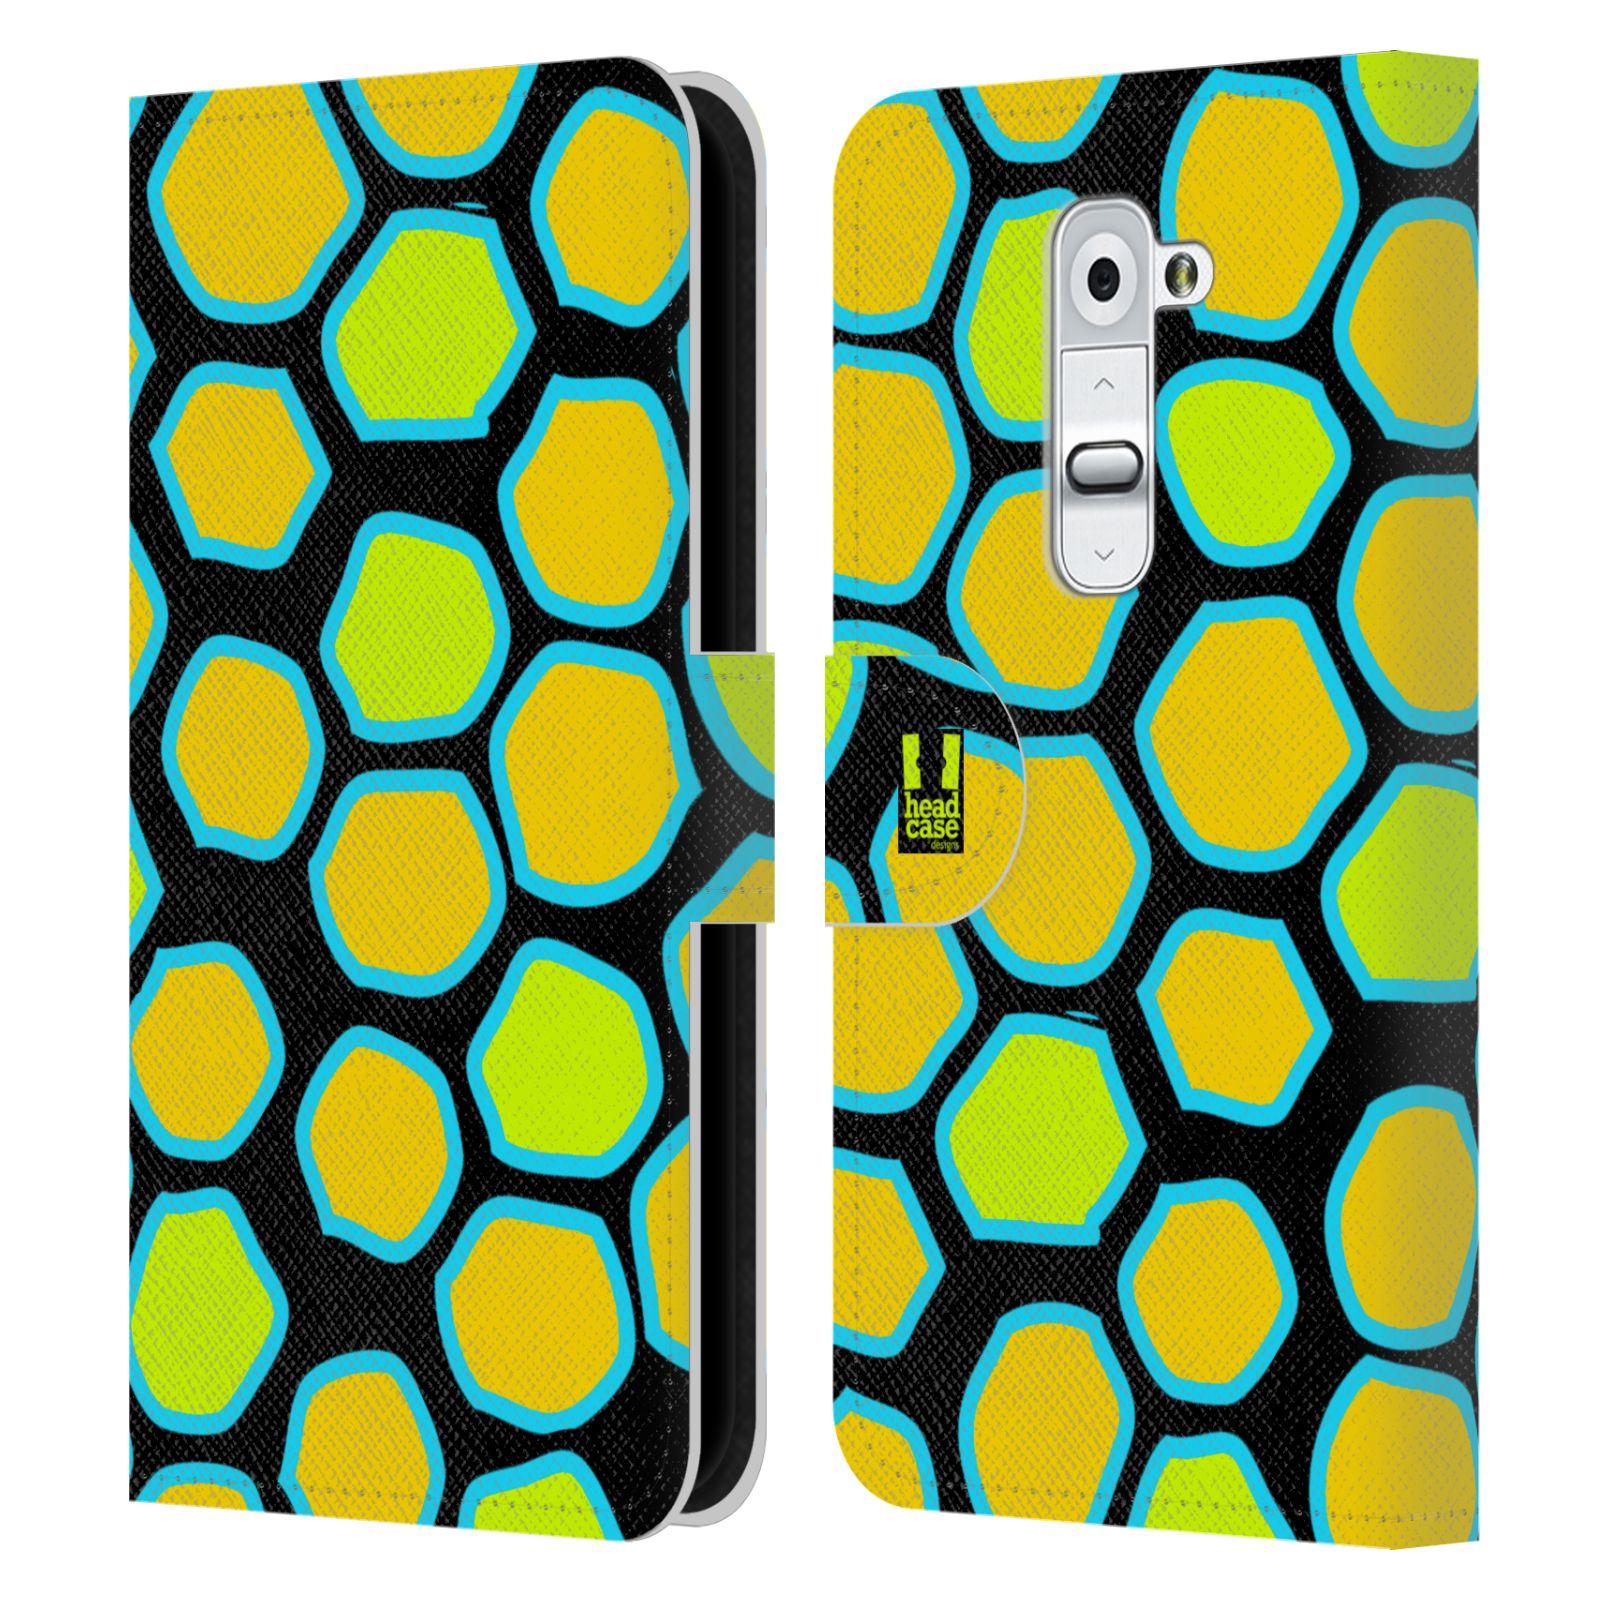 HEAD CASE Flipové pouzdro pro mobil LG G2 (D802) Zvířecí barevné vzory žlutý had